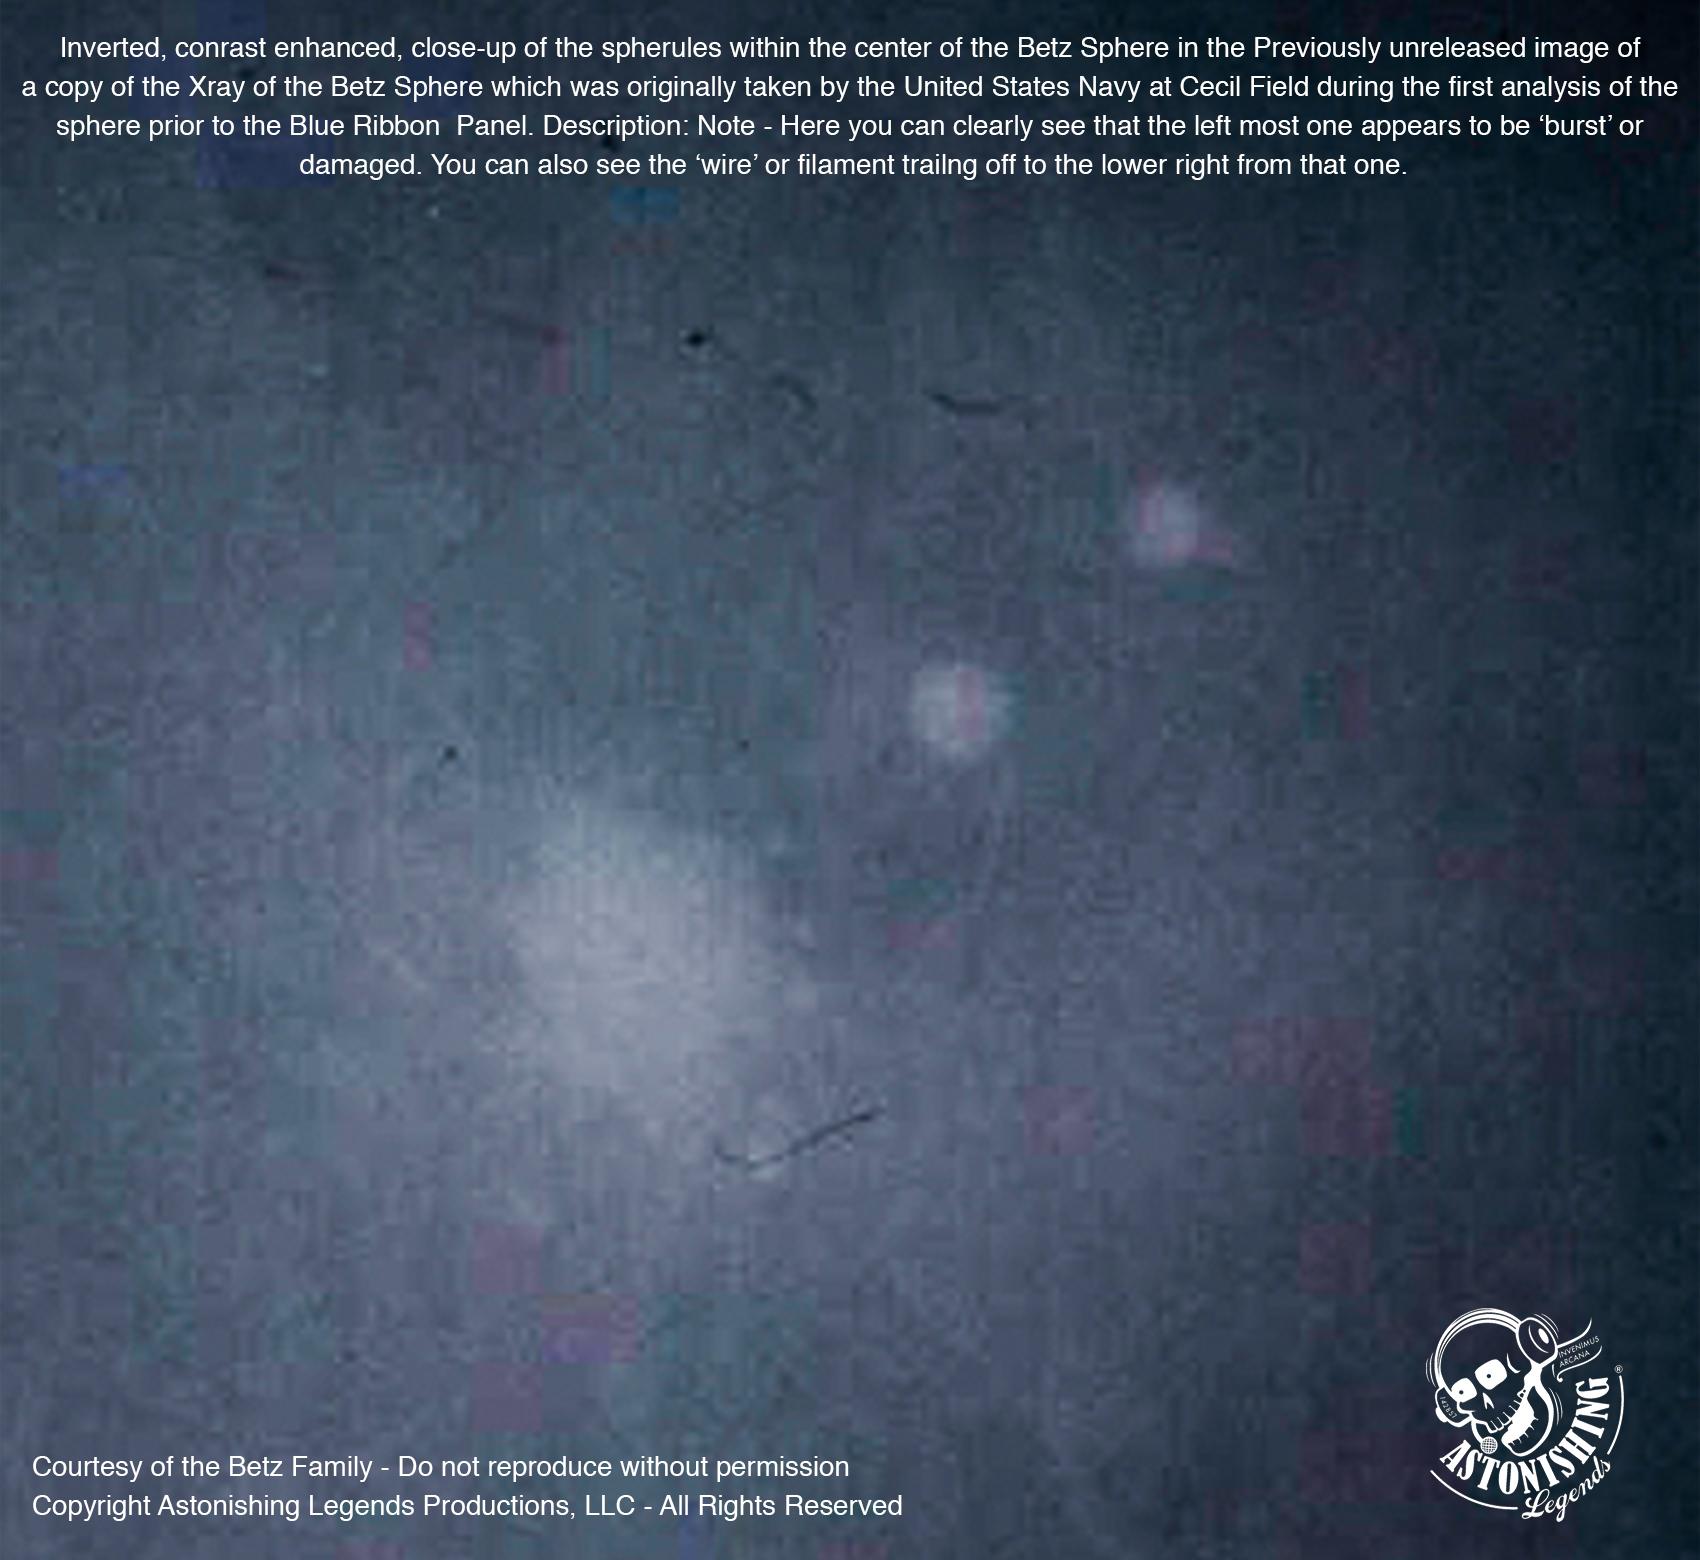 BETZ SPHERE X-RAY-InvertedContrastEnhancedSpherulesClose.jpg